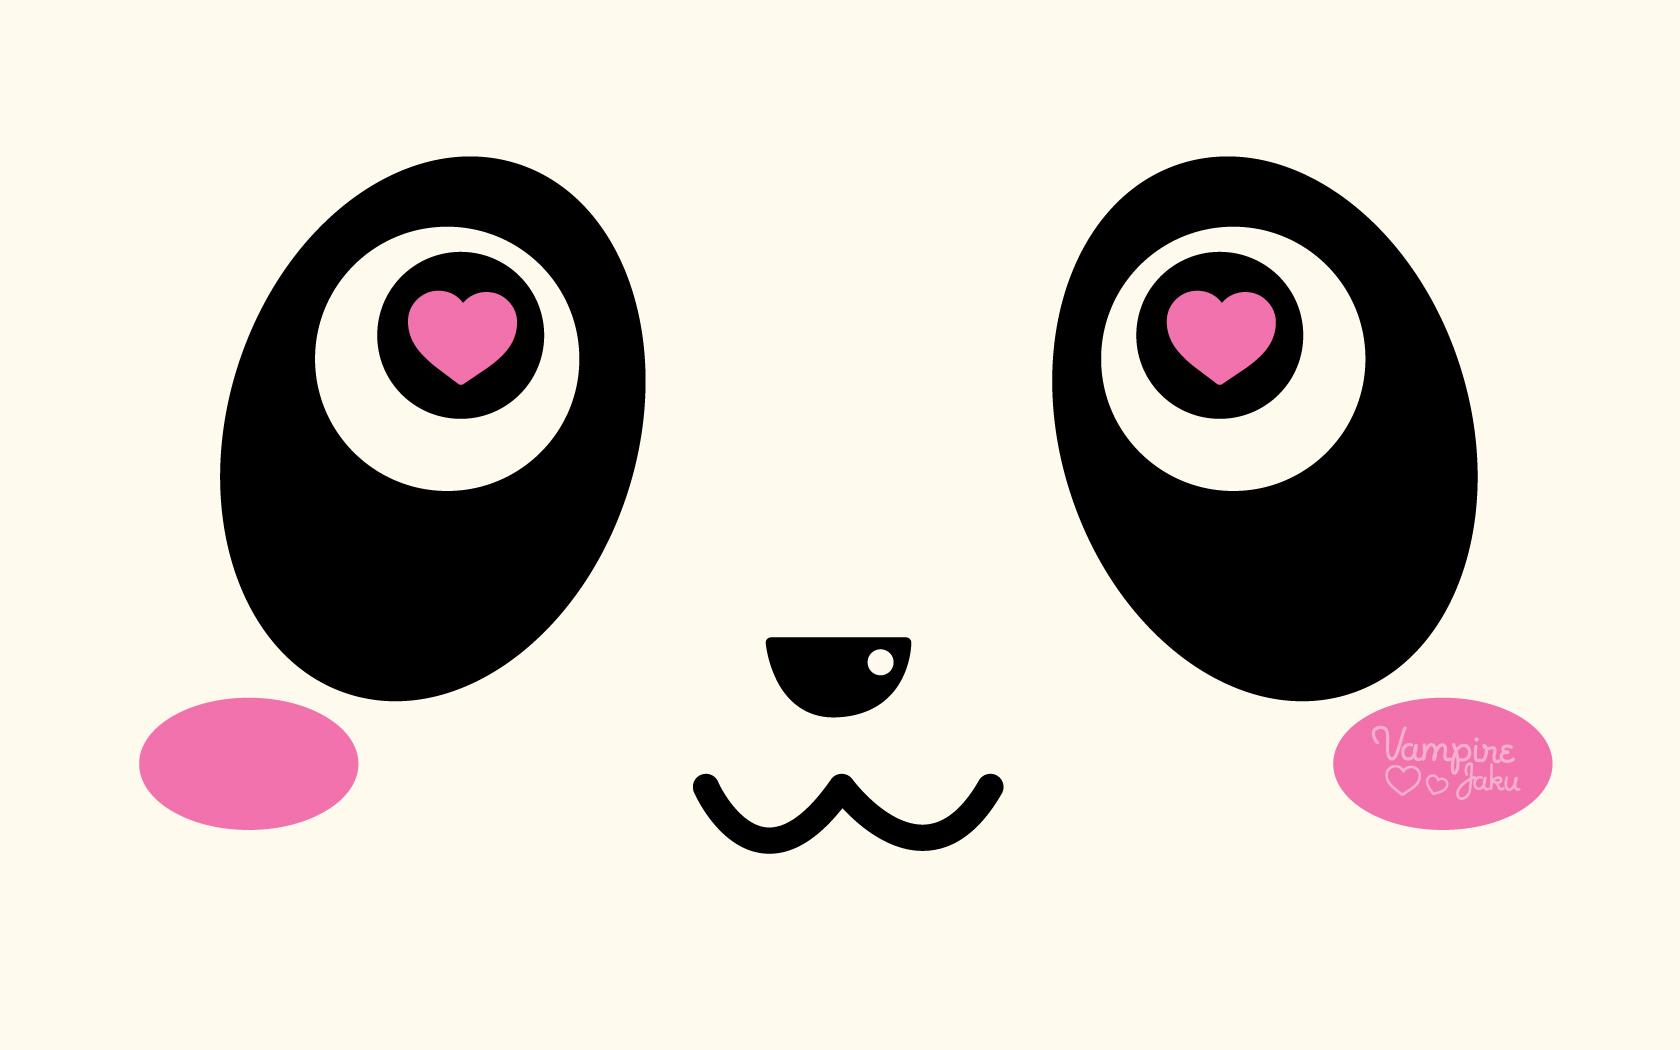 Panda Face Wallpaper Cute 10338 Wallpaper Cool Walldiskpapercom 1680x1050